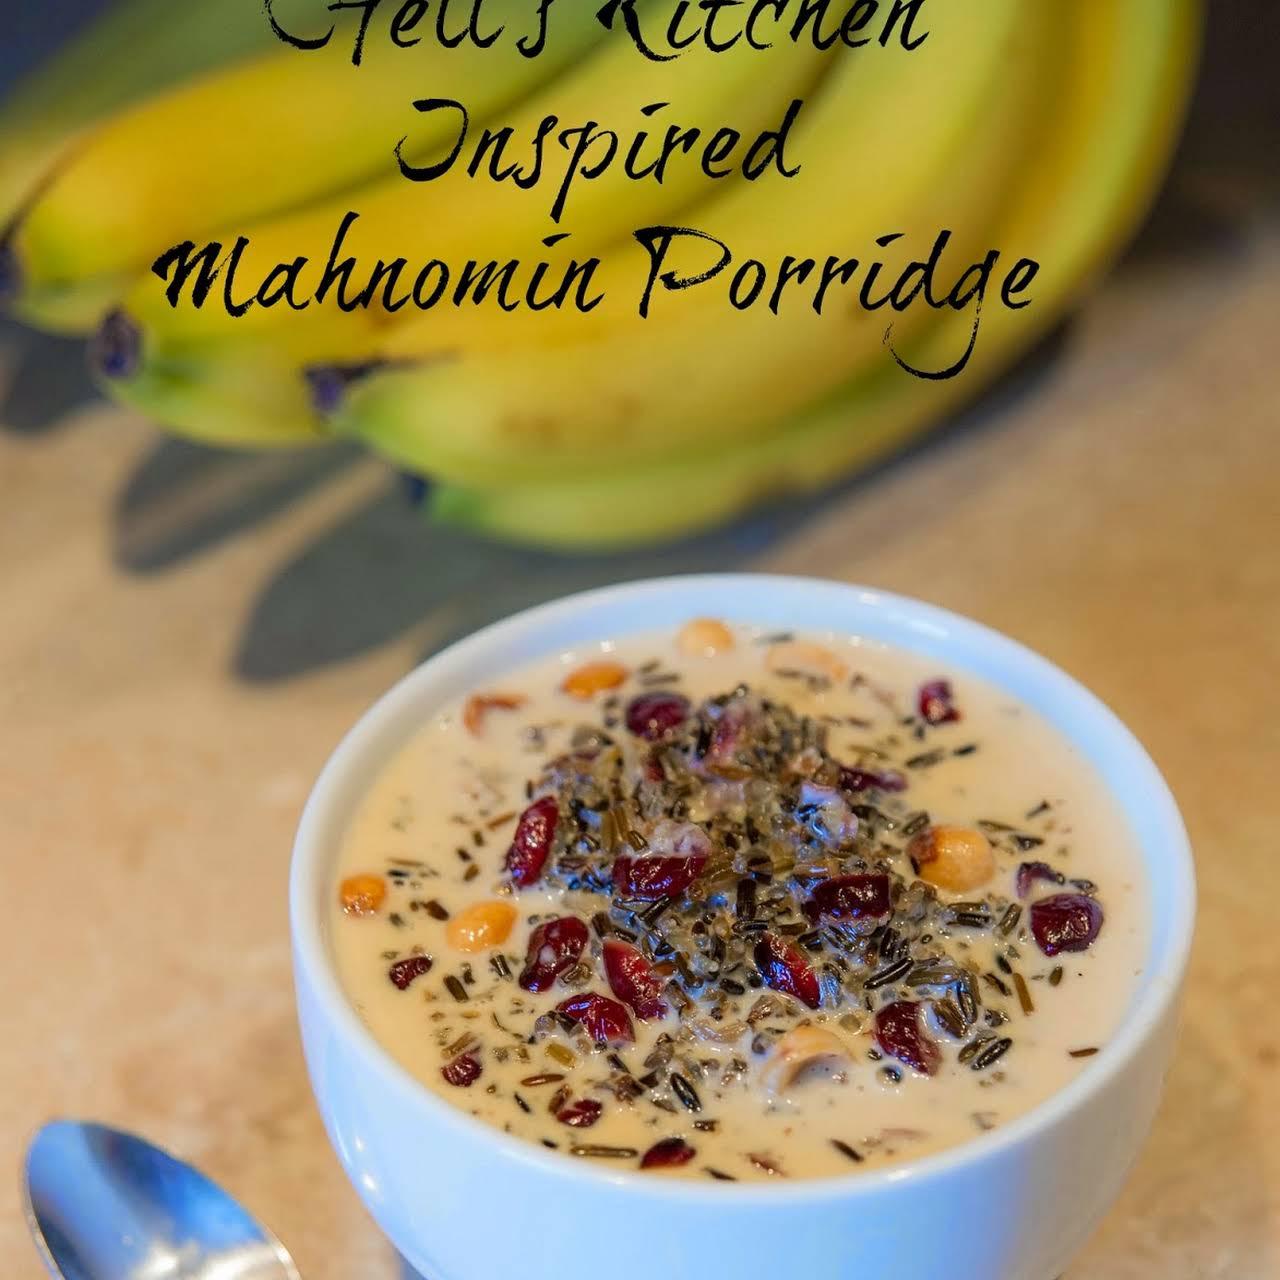 Hells Kitchen Inspired Mahnomin Porridge Recipe & Hells Kitchen Restaurant Review